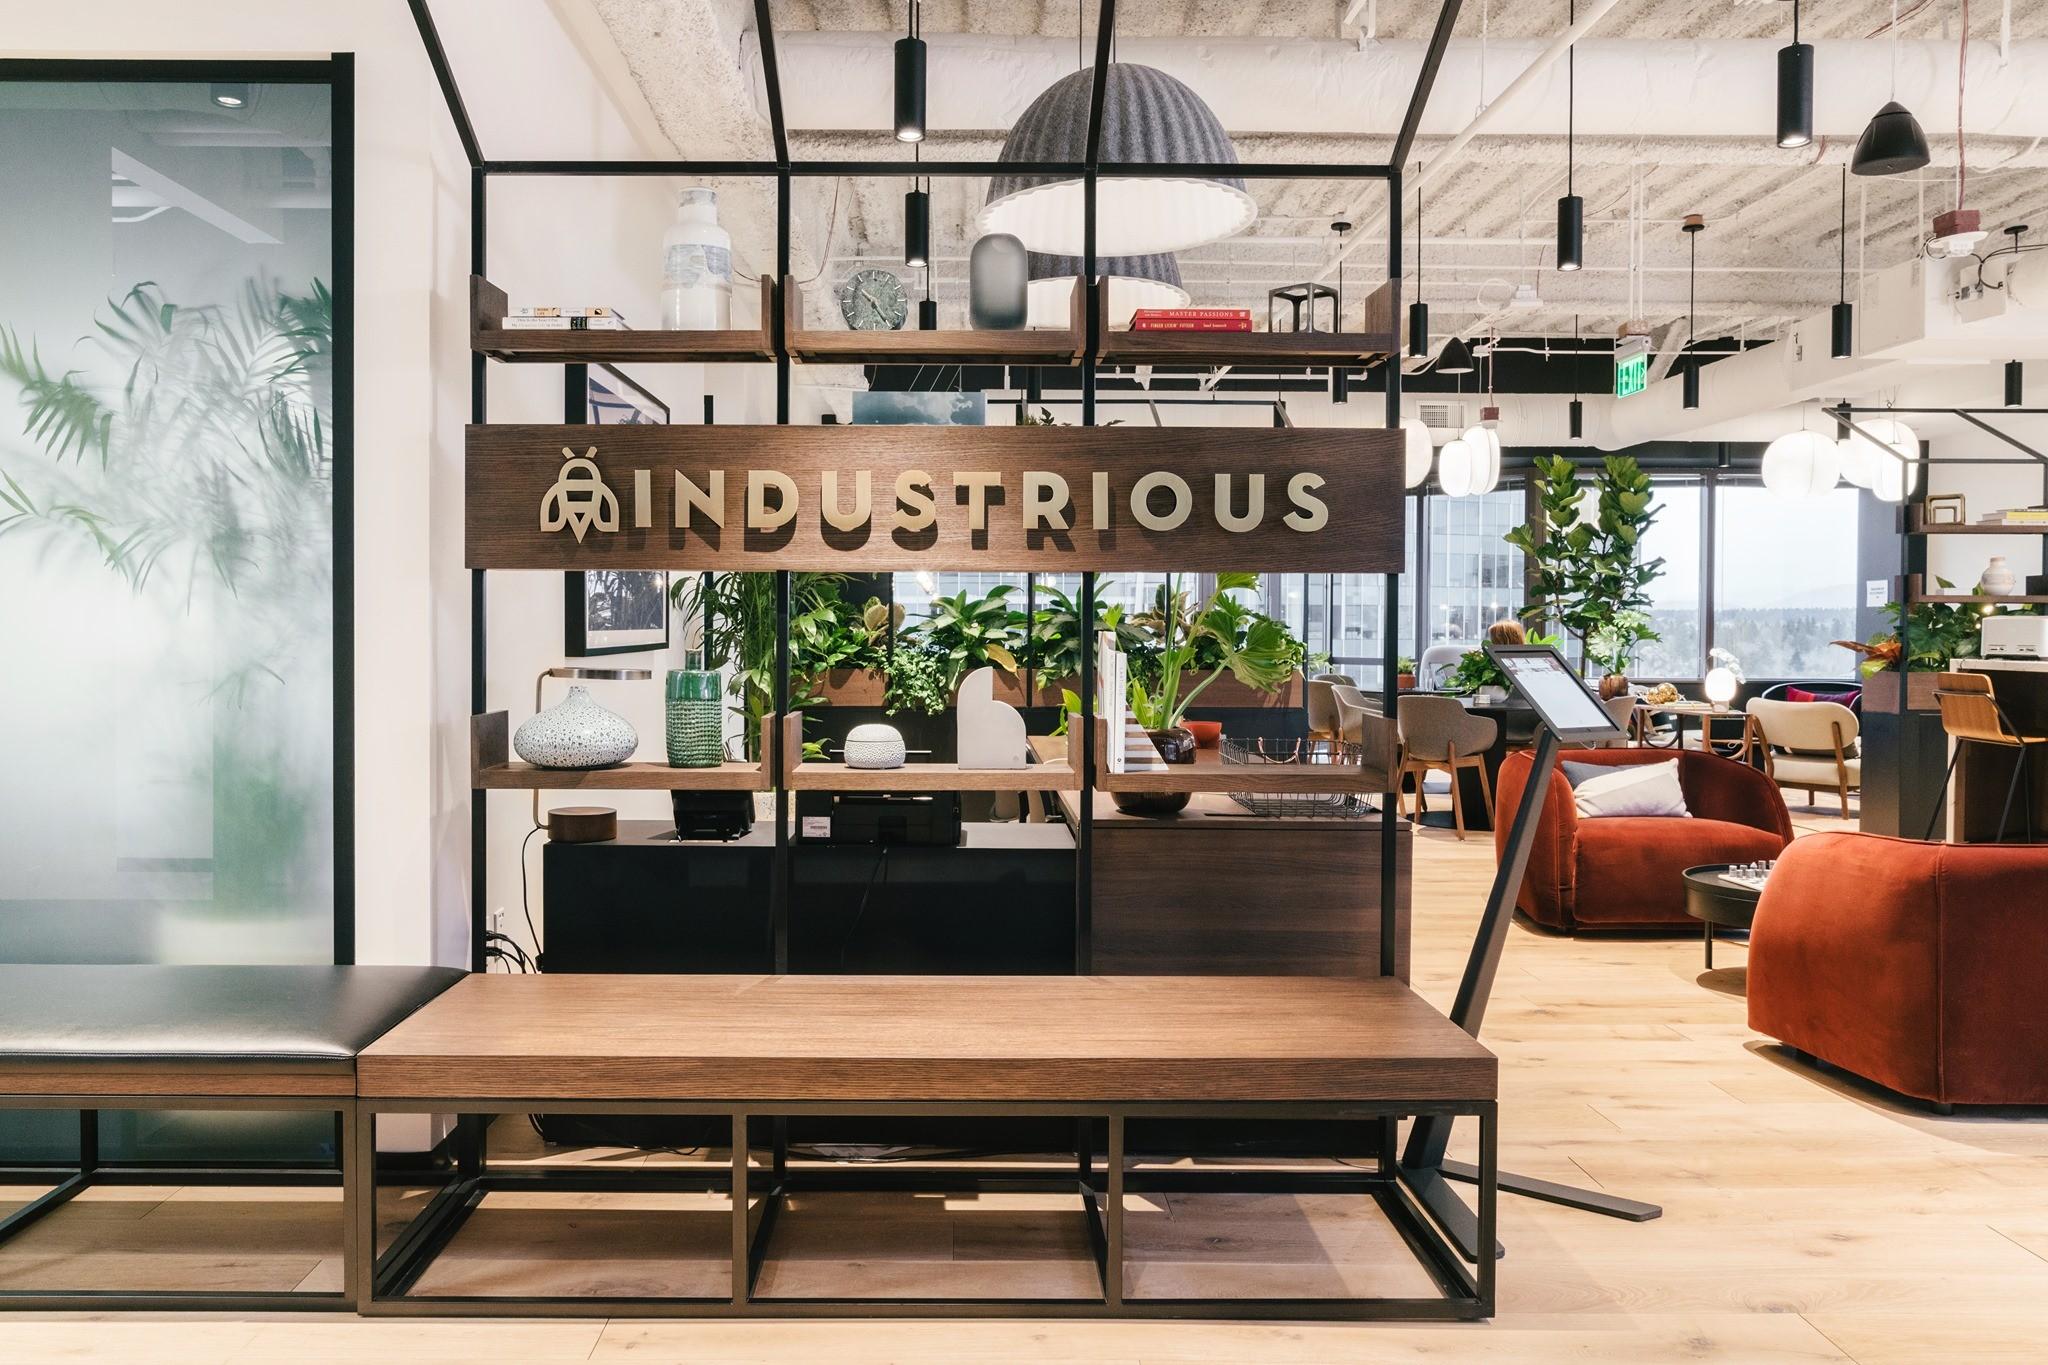 Industrious | LinkedIn